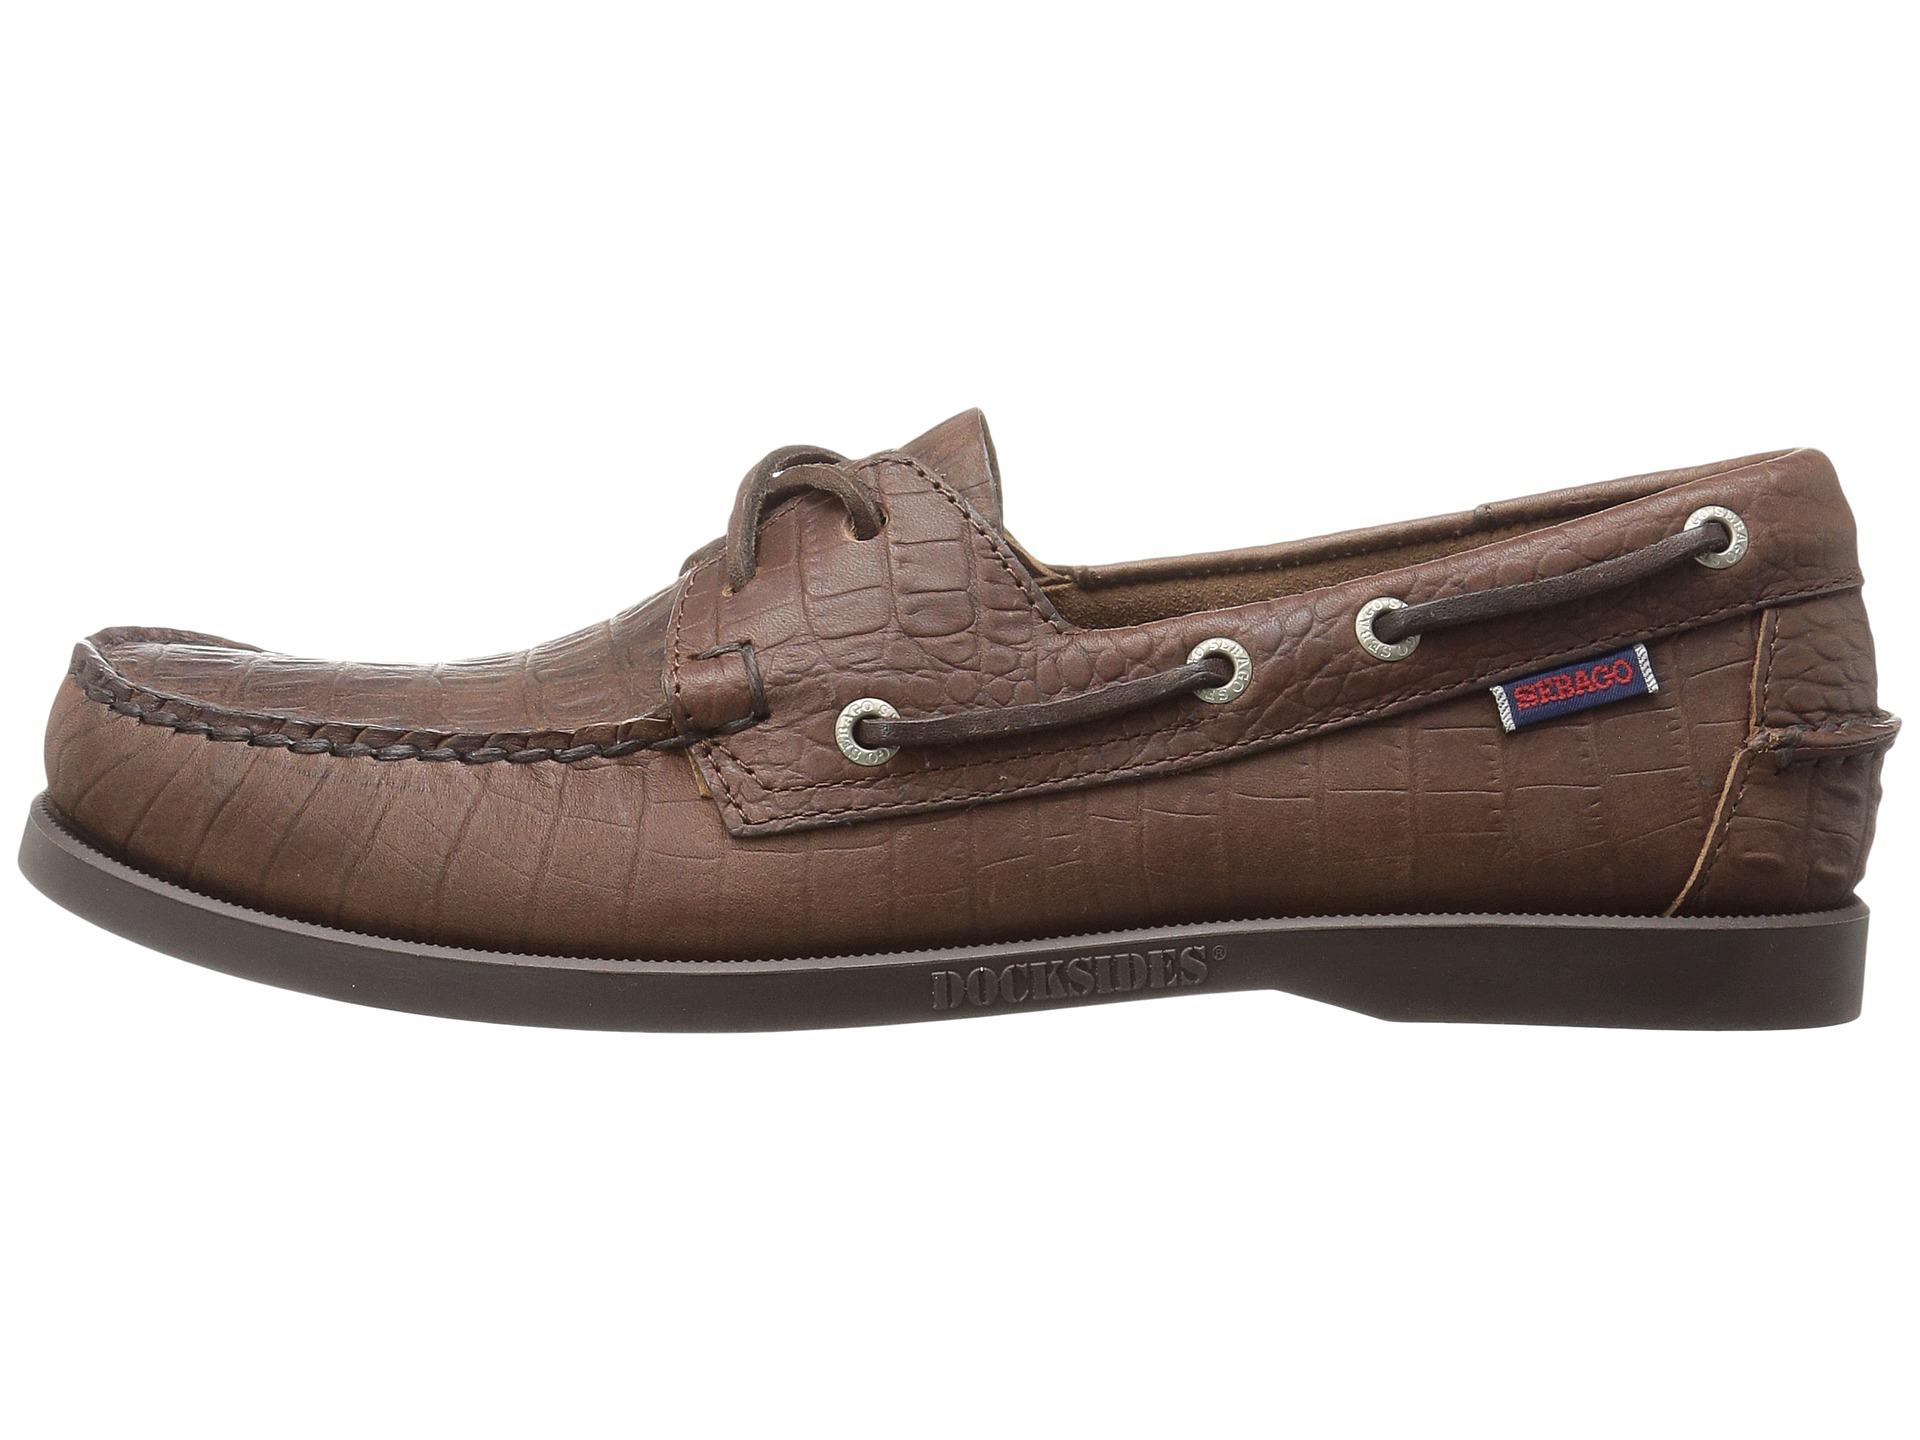 Sebago Dockside  Eyelet Leather Boat Shoes